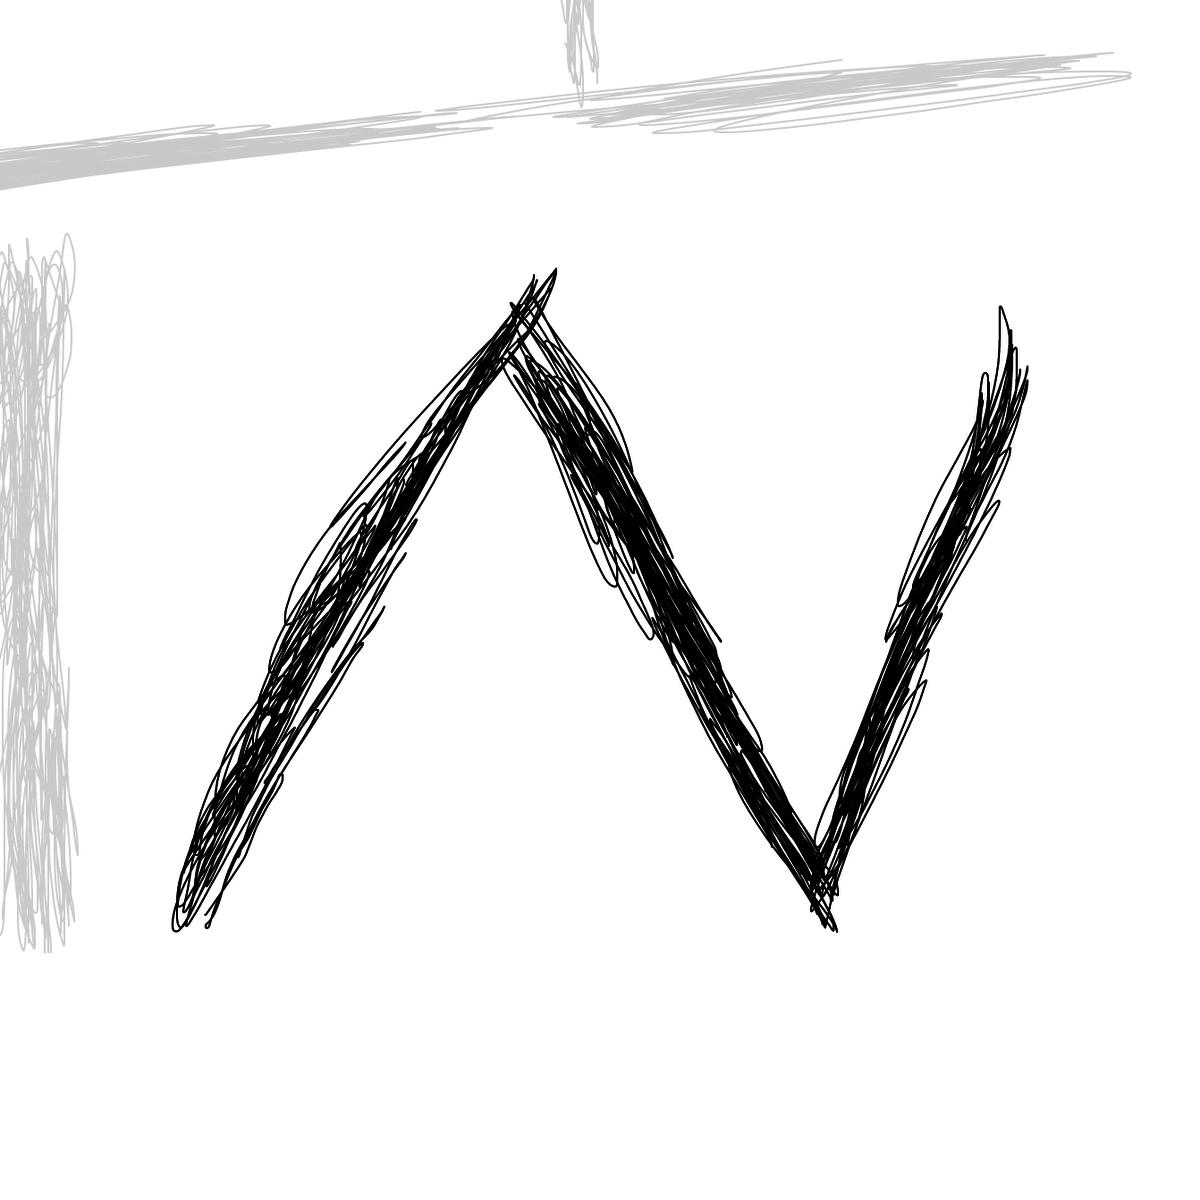 BAAAM drawing#8596 lat:59.9170188903808600lng: 10.7277536392211910